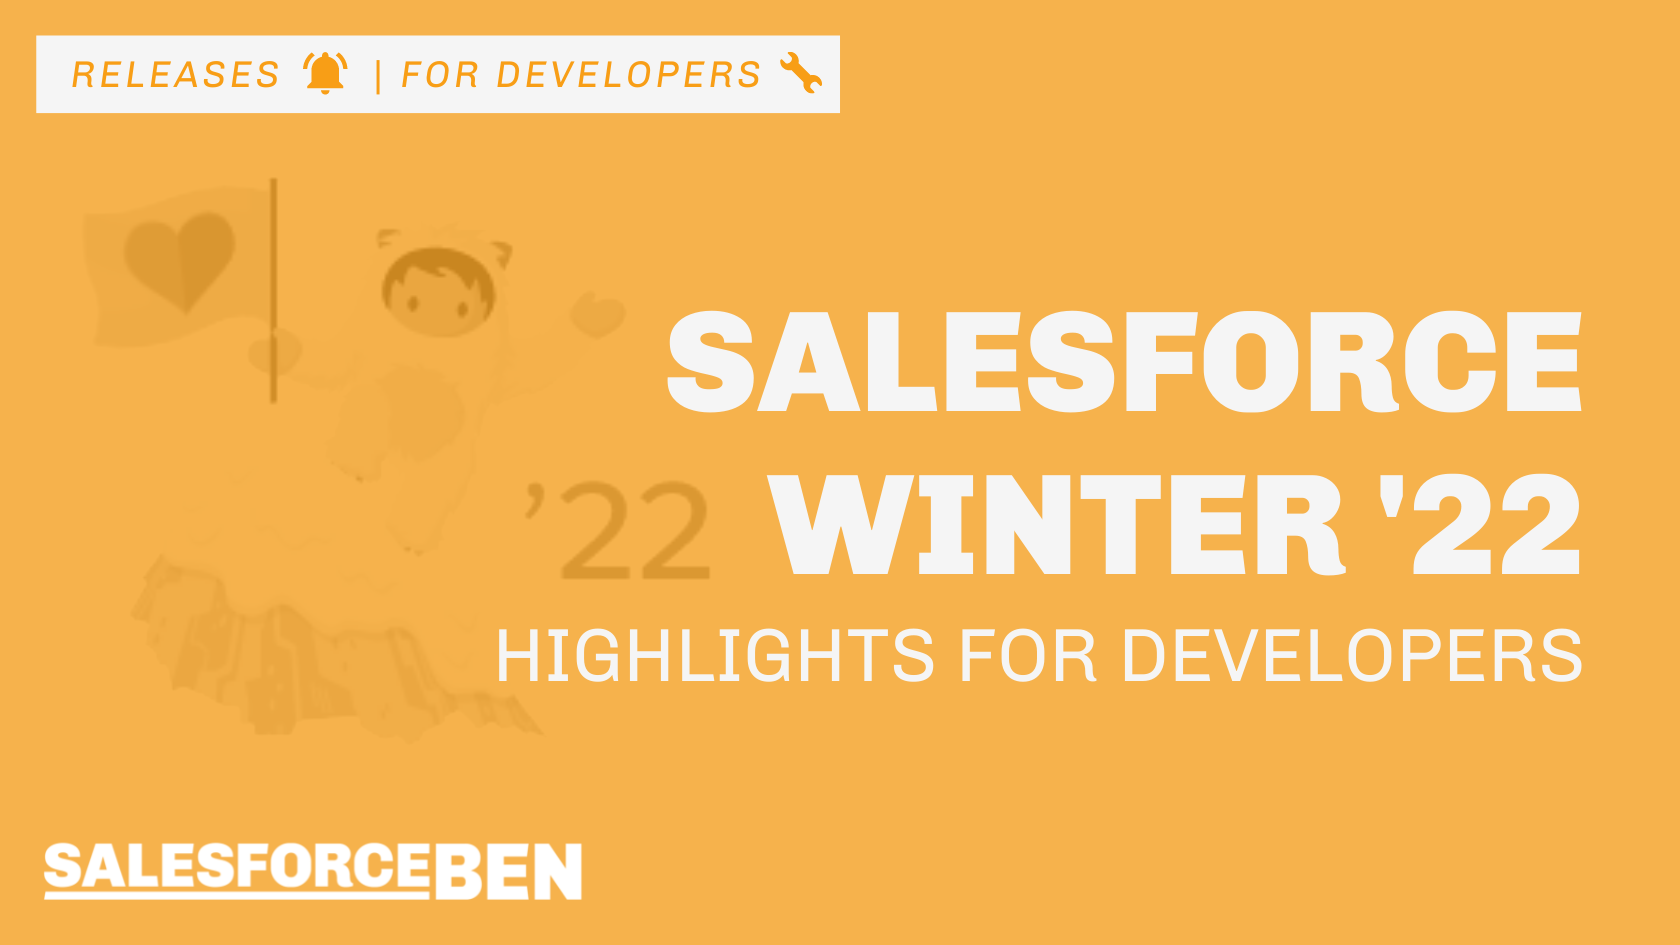 Salesforce Winter '22 Highlights for Developers